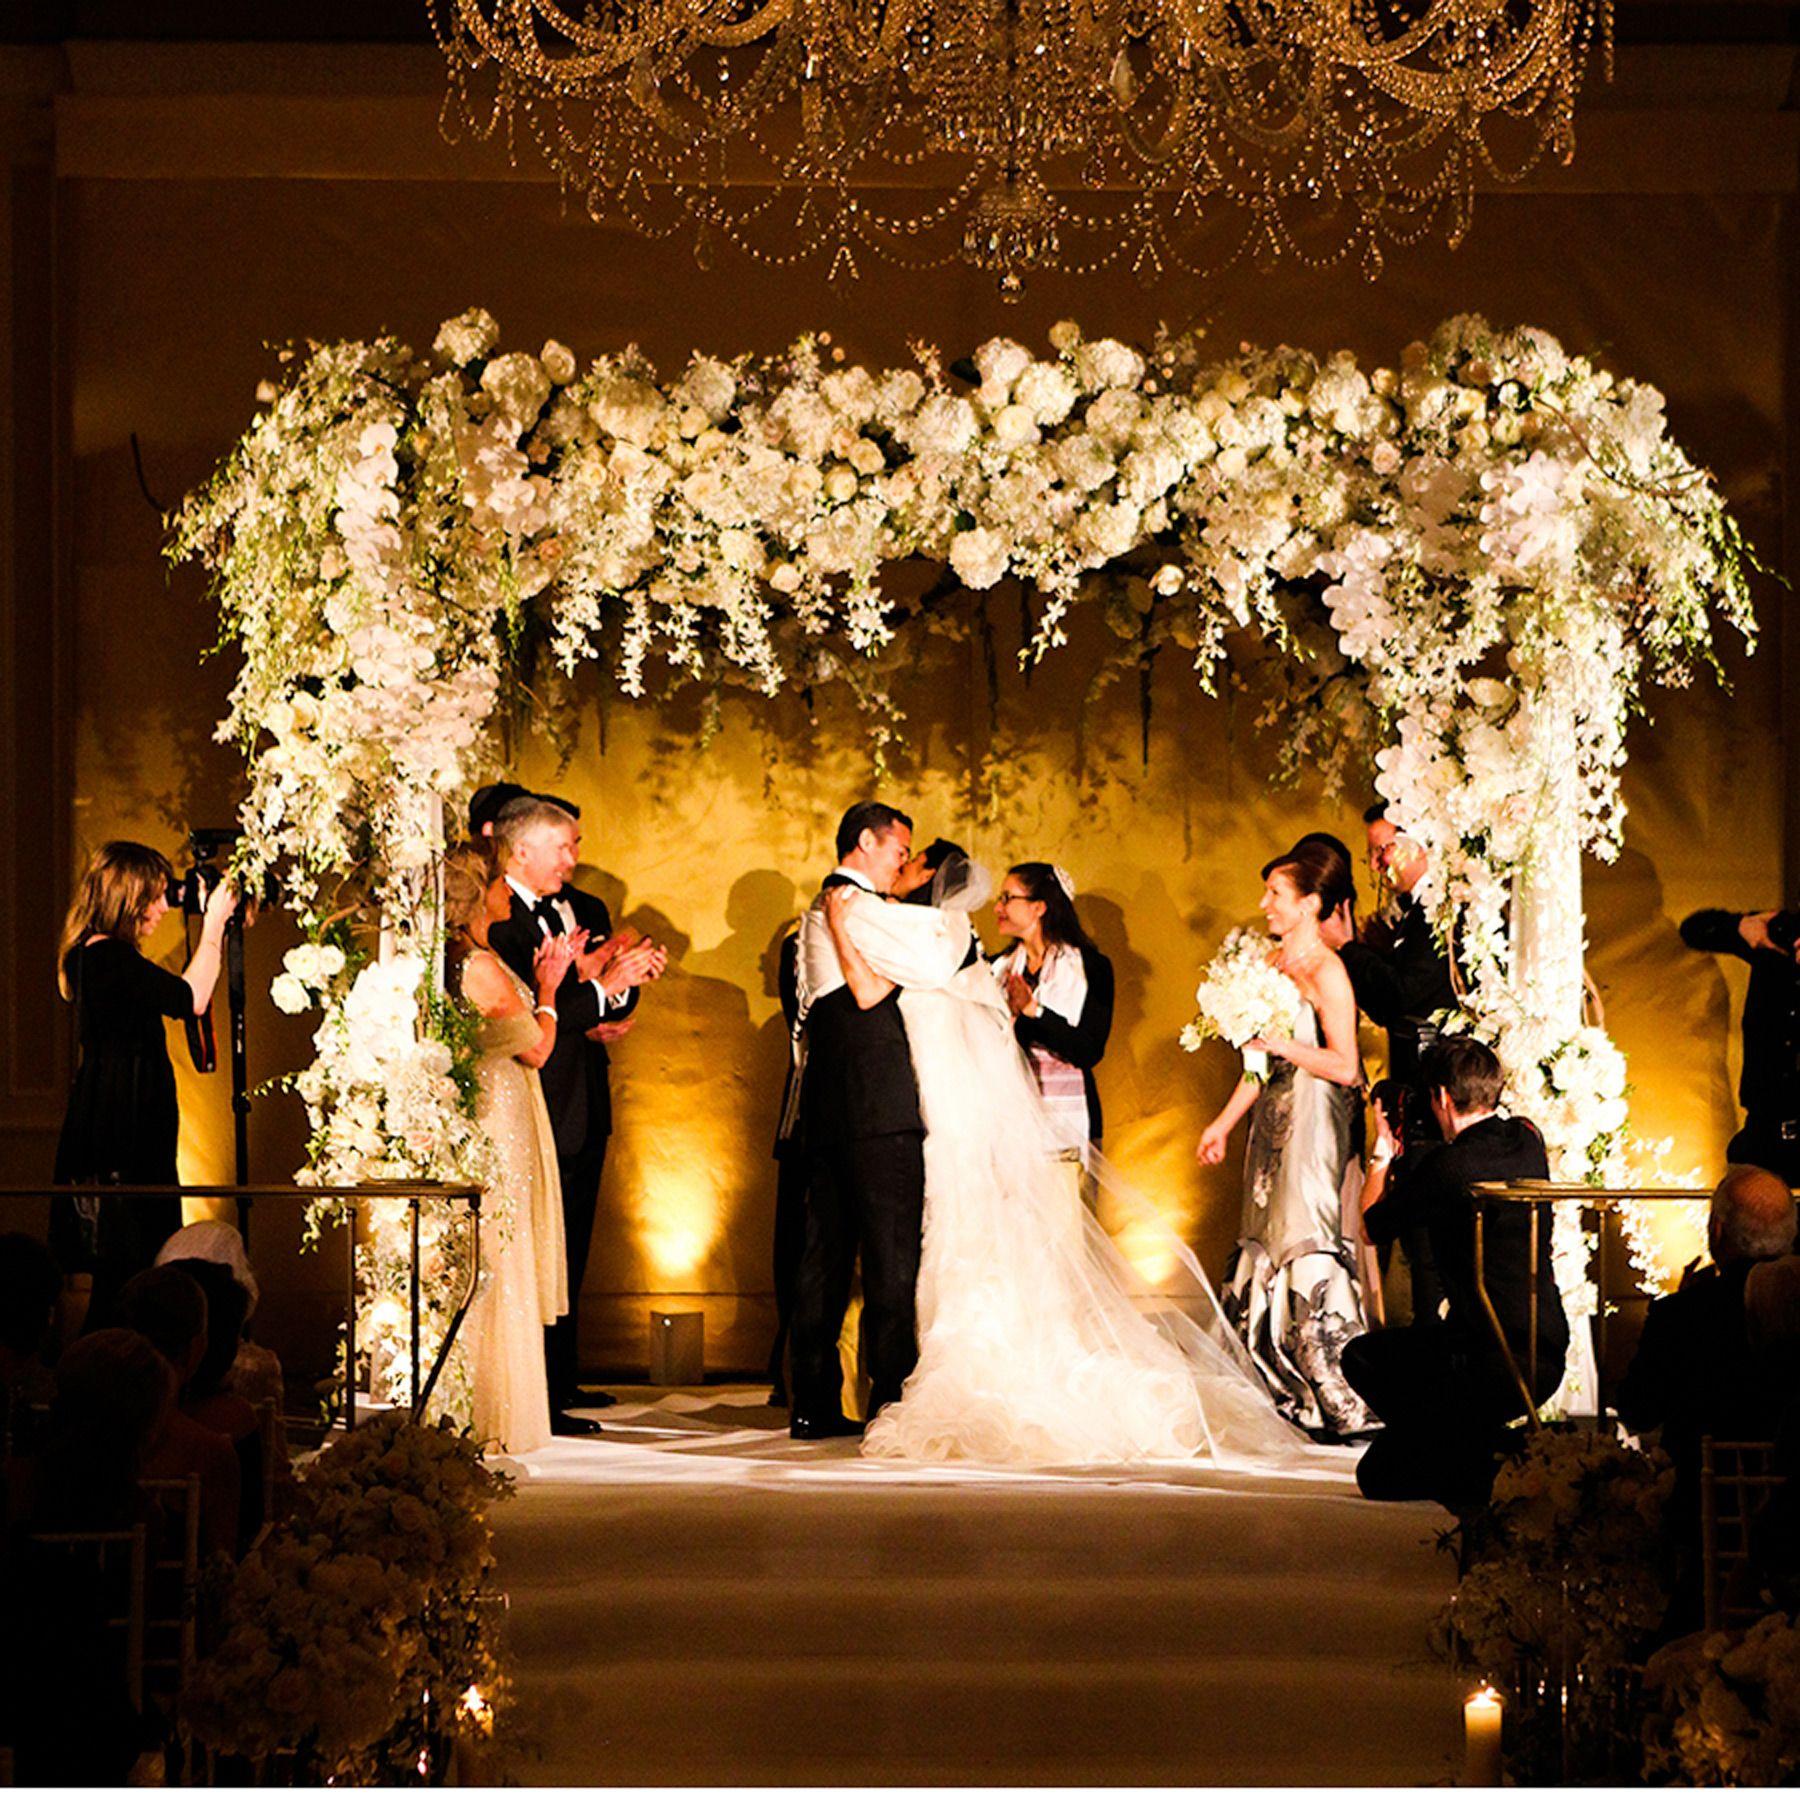 Jewish Wedding Altar Hopa: Classic Uptown Wedding